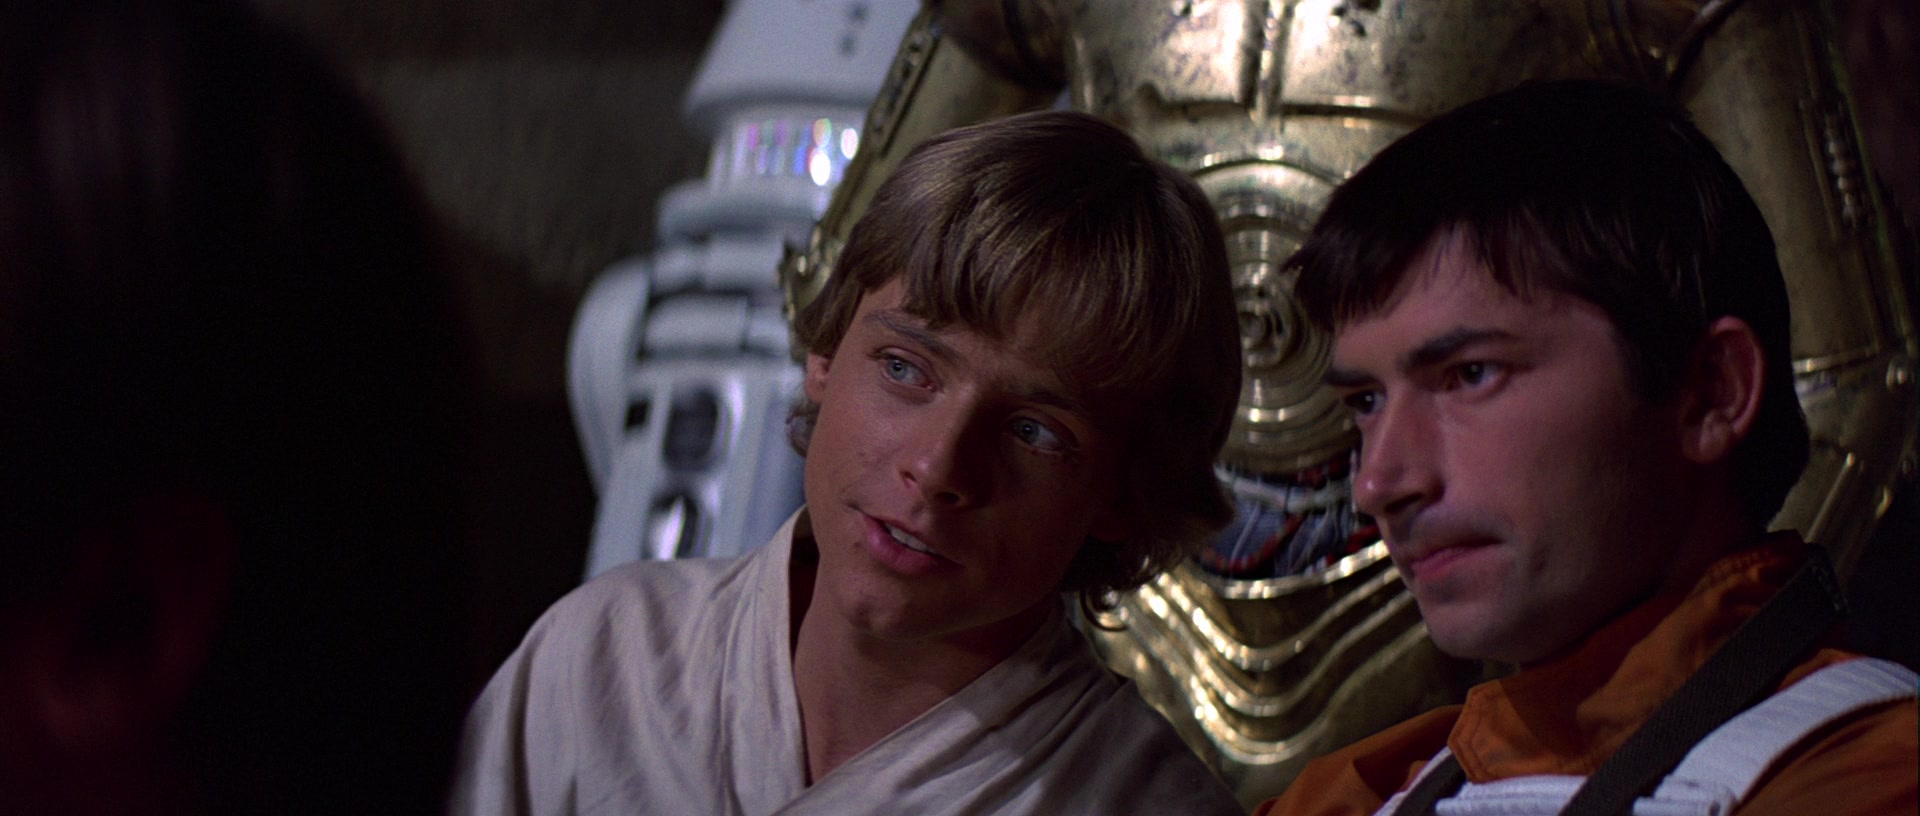 star wars a new hope luke skywalker col takbright